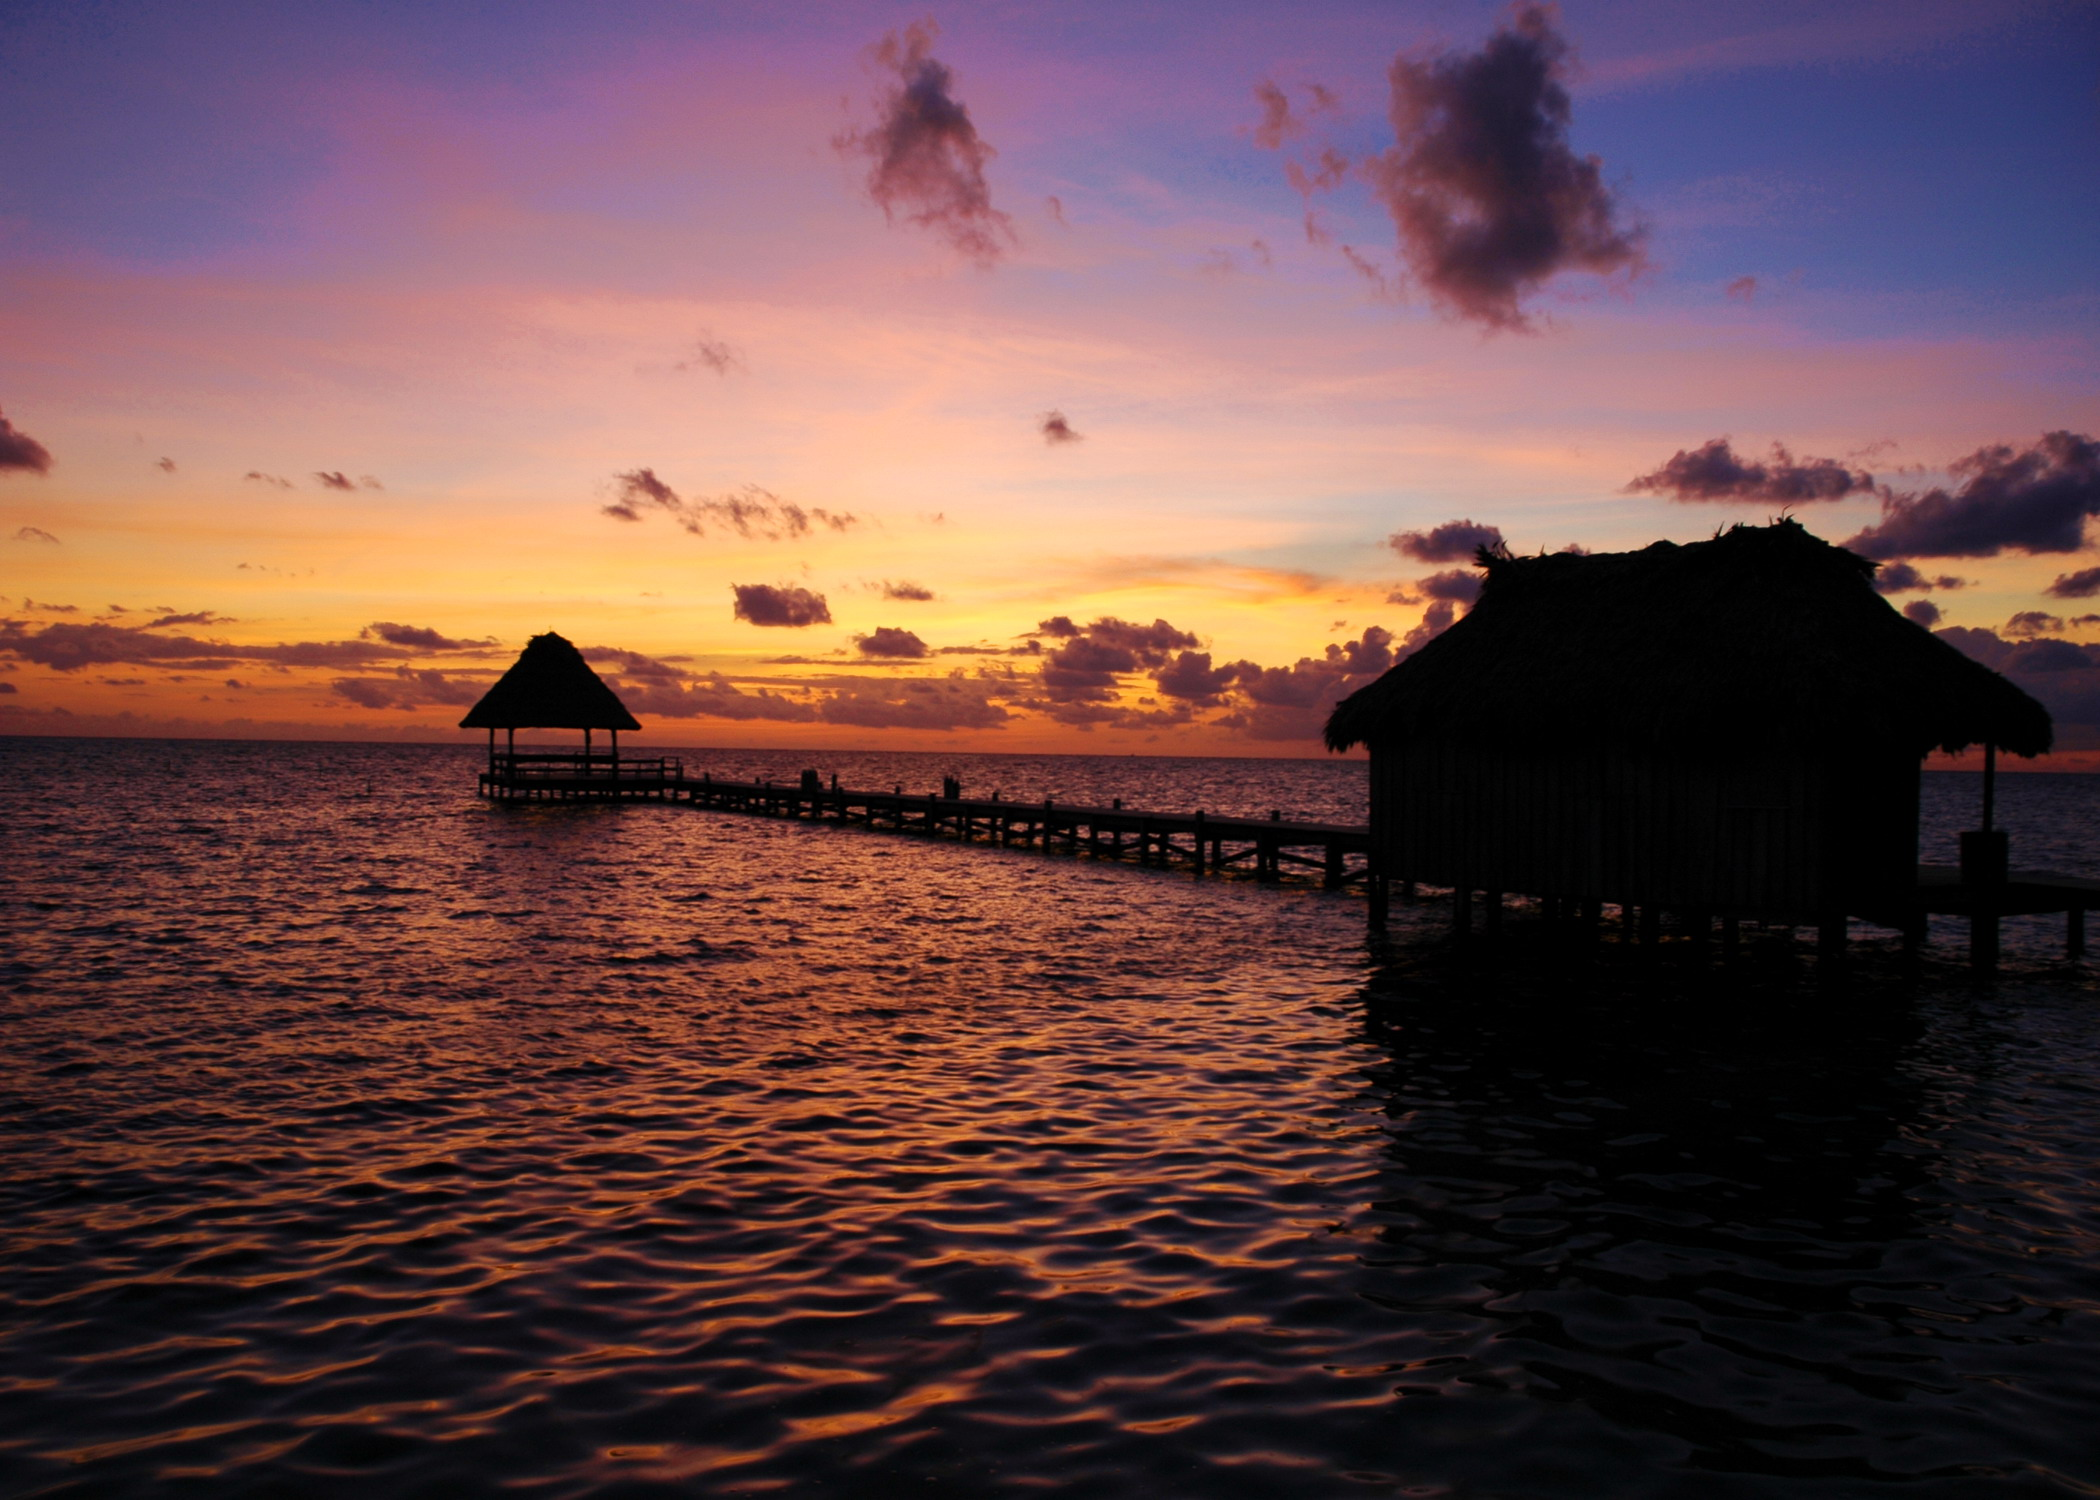 Sunrise over Dock (Ambergris Caye)